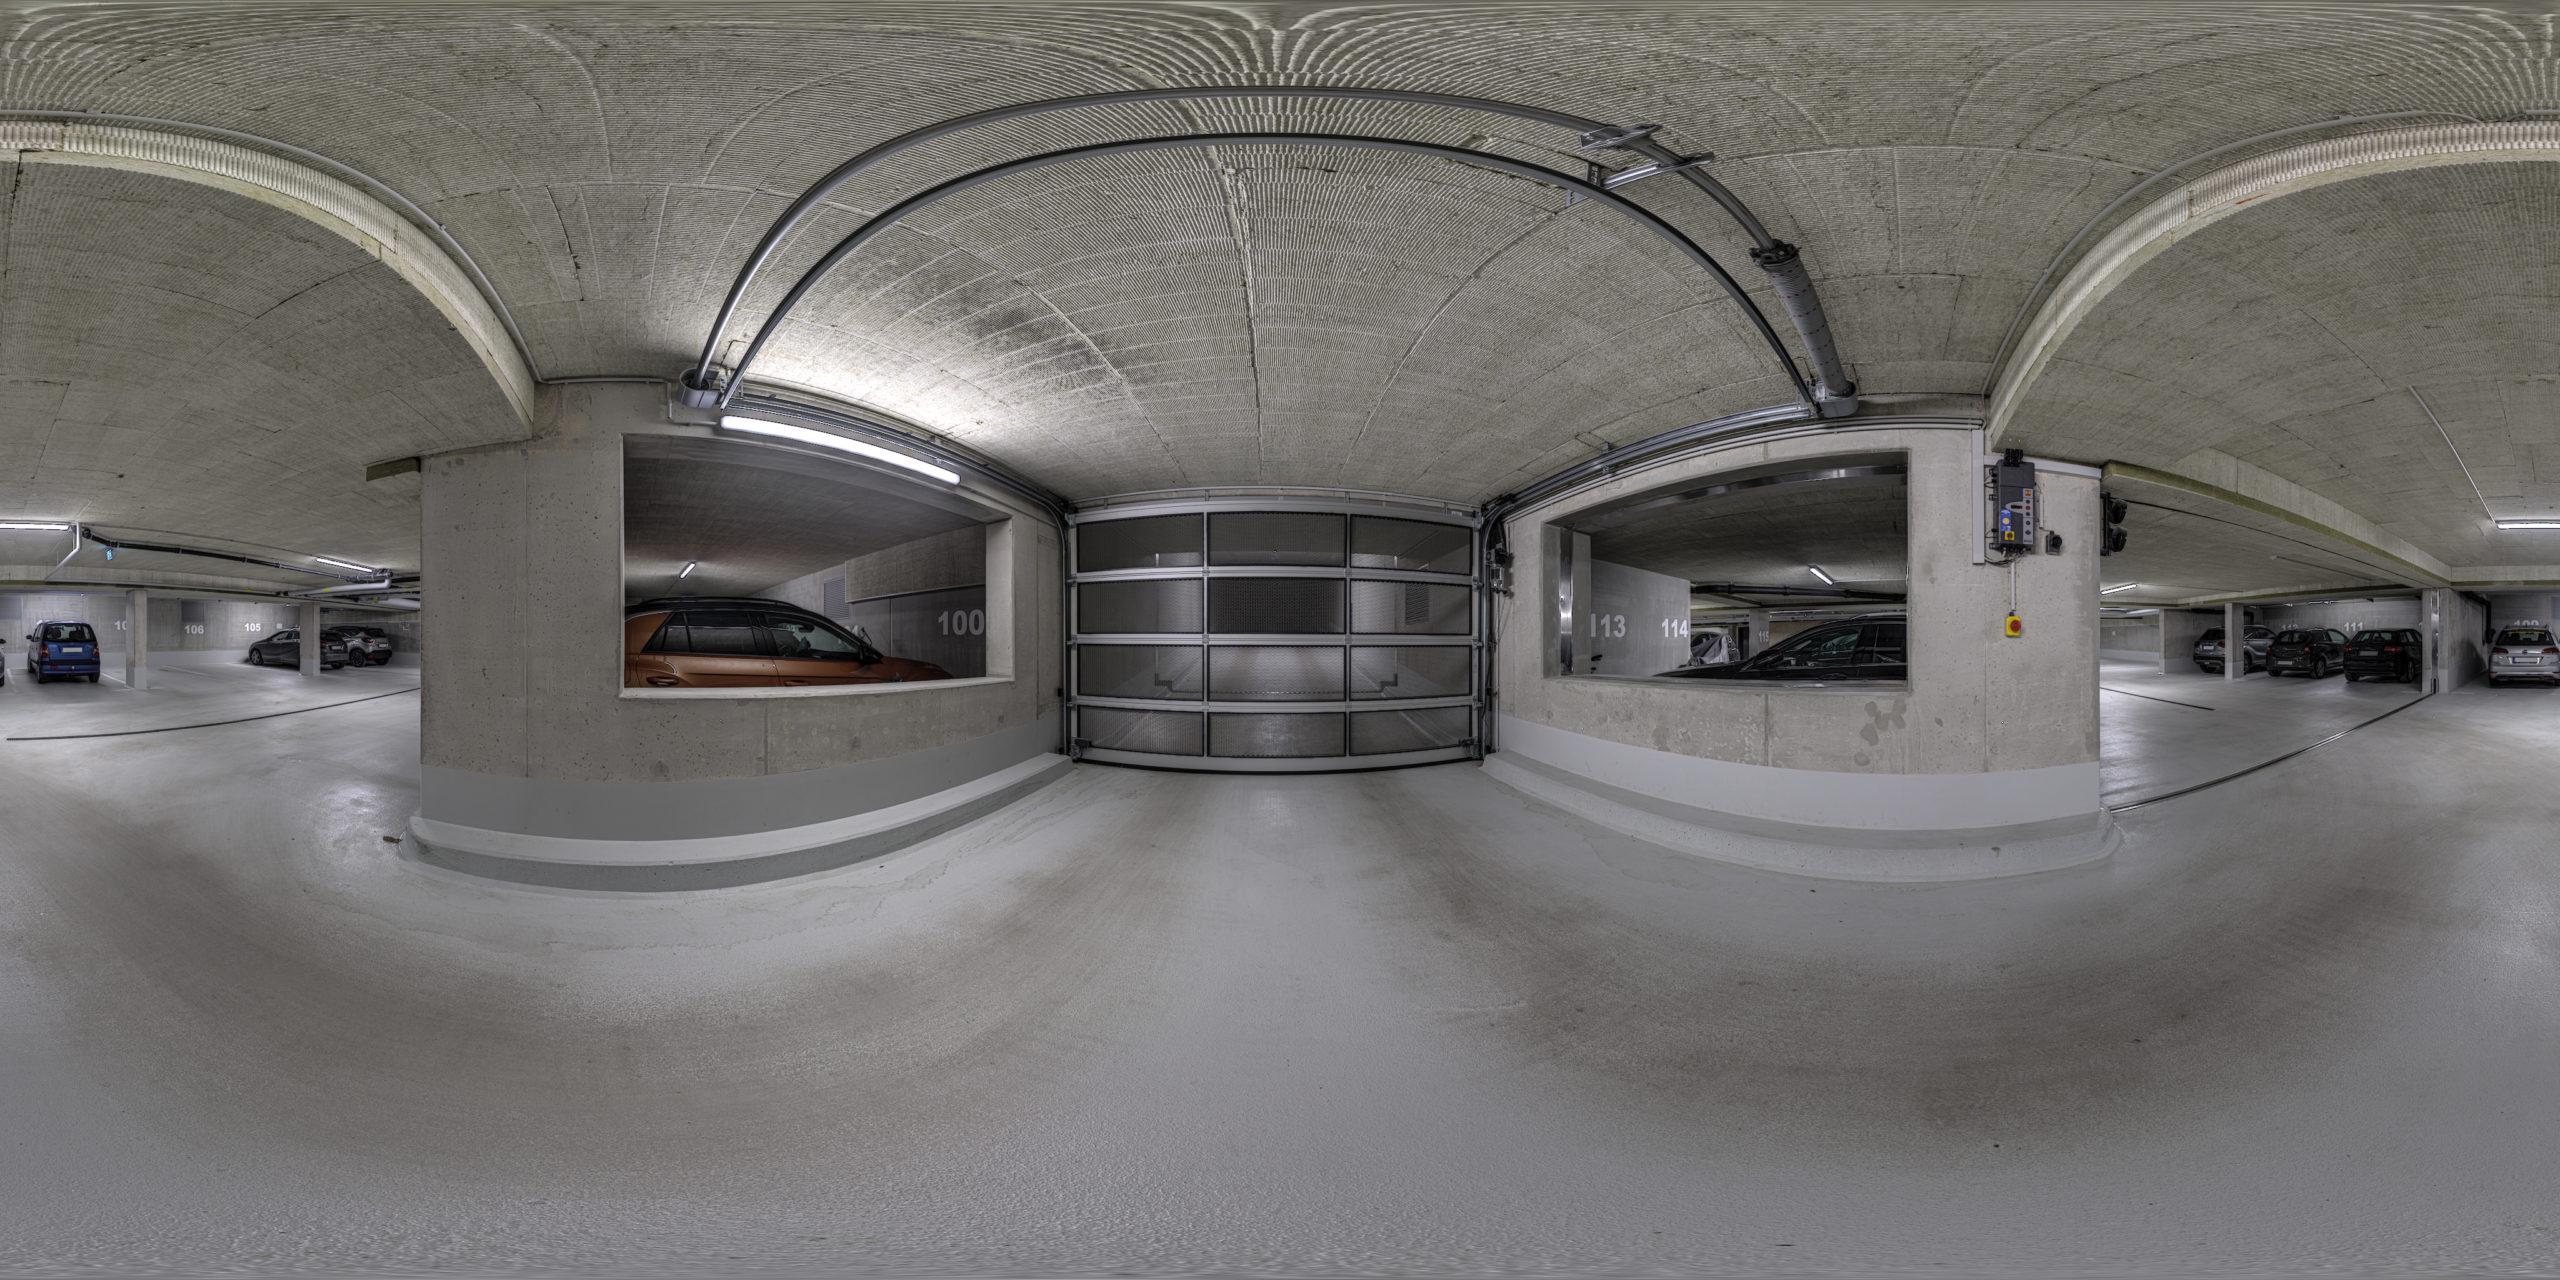 HDRI-Skies-Parking-Garage-Georgensgmünd